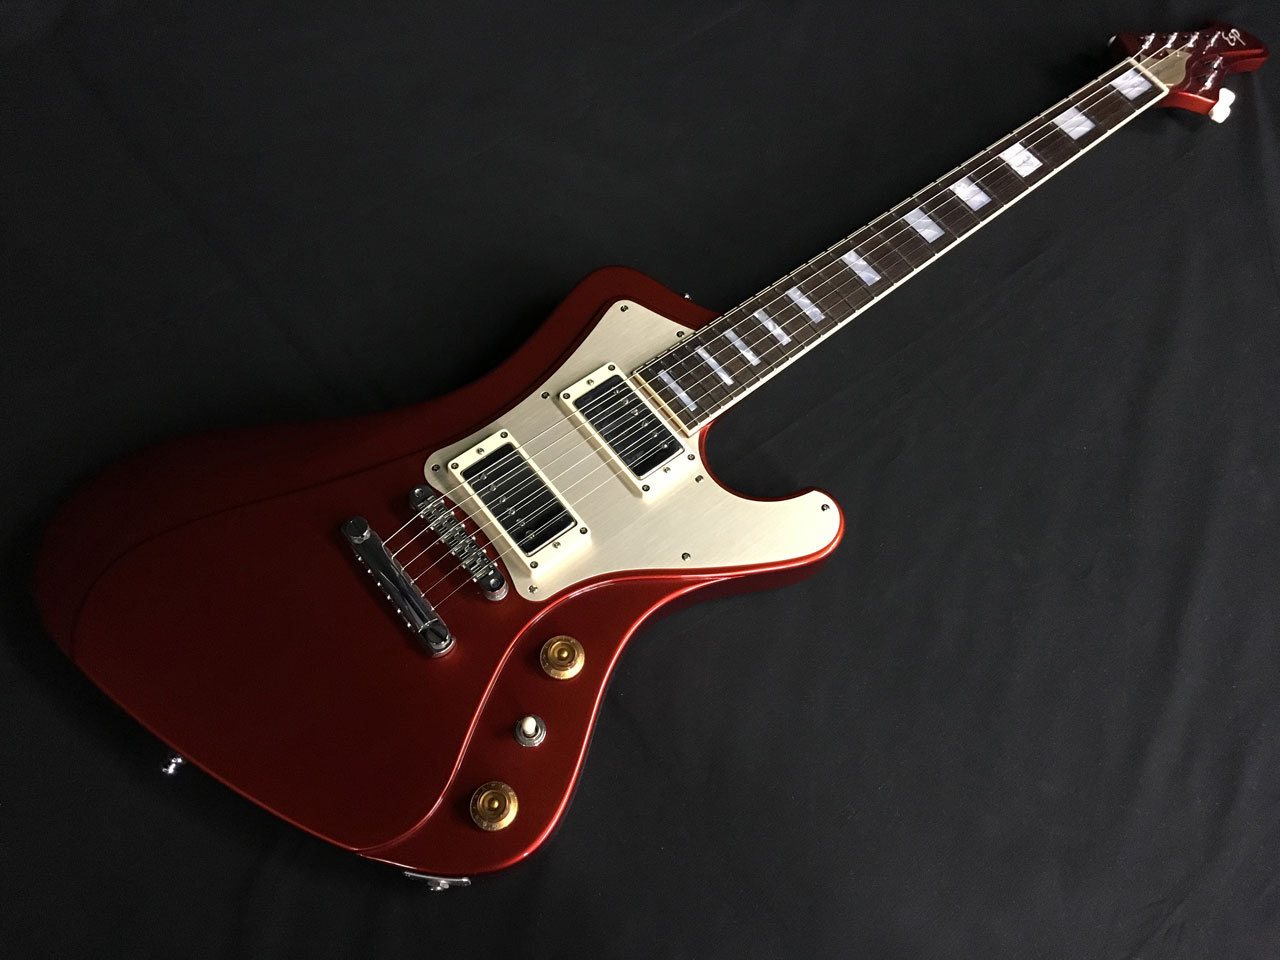 【即納可能】ESP STREAM-GT Classic / Vintage Candy Apple Red